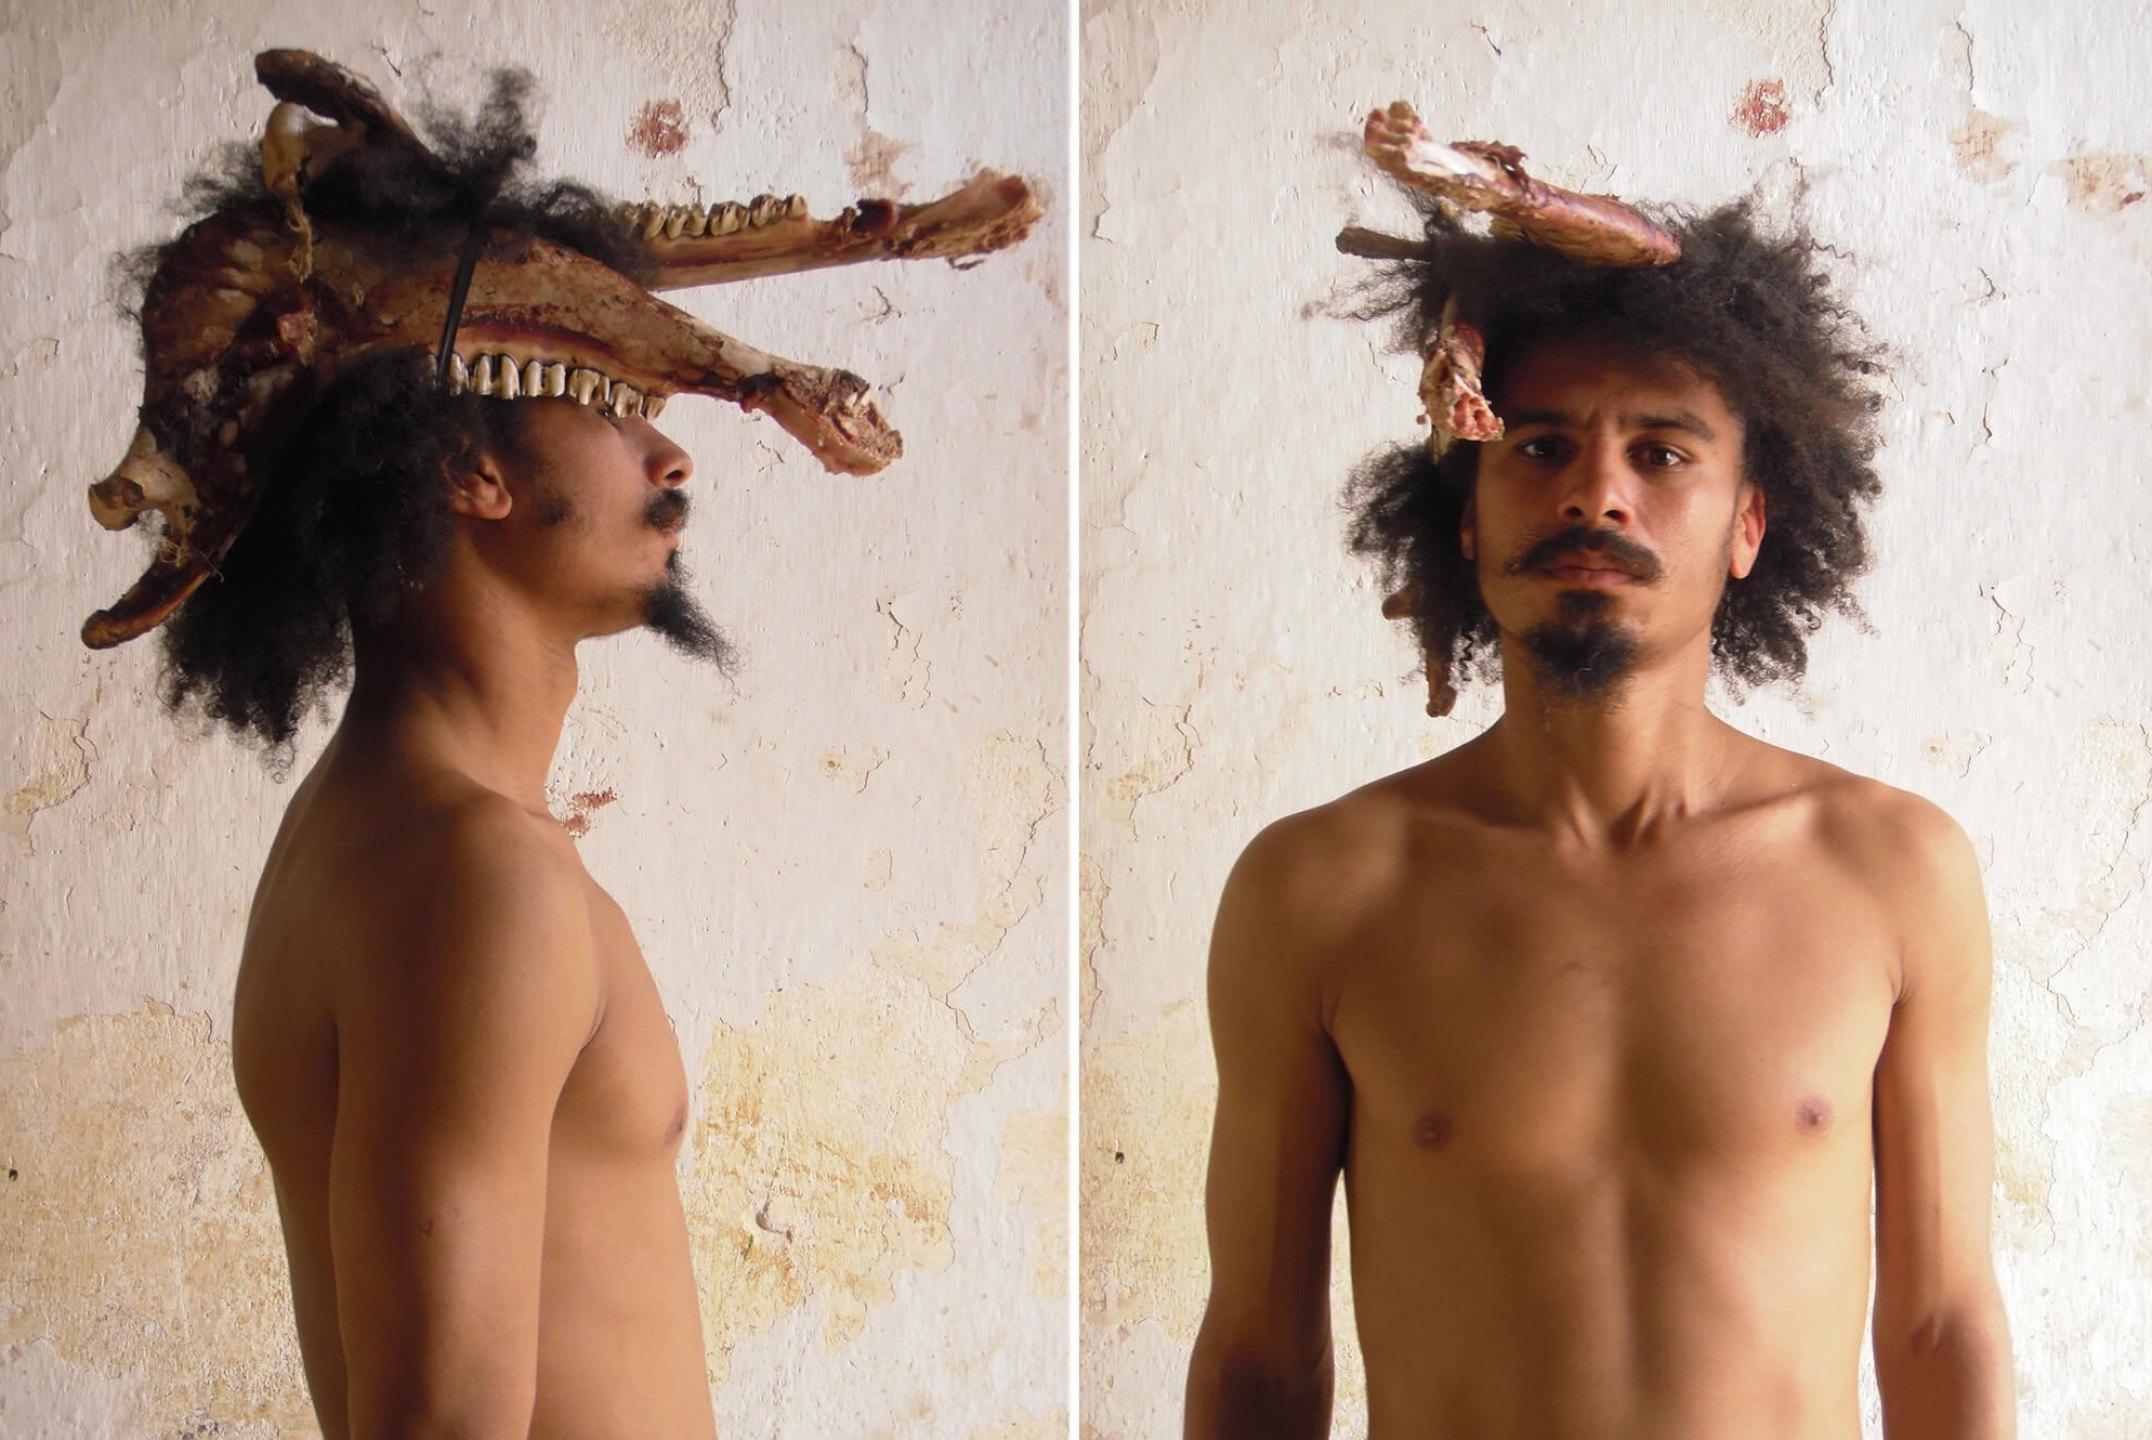 Paulo Nazareth,<em>untitled, from Mi Imagen de Hombre Exotico series,</em>2011, photo printing on cotton paper, 29 × 22 cm - Mendes Wood DM